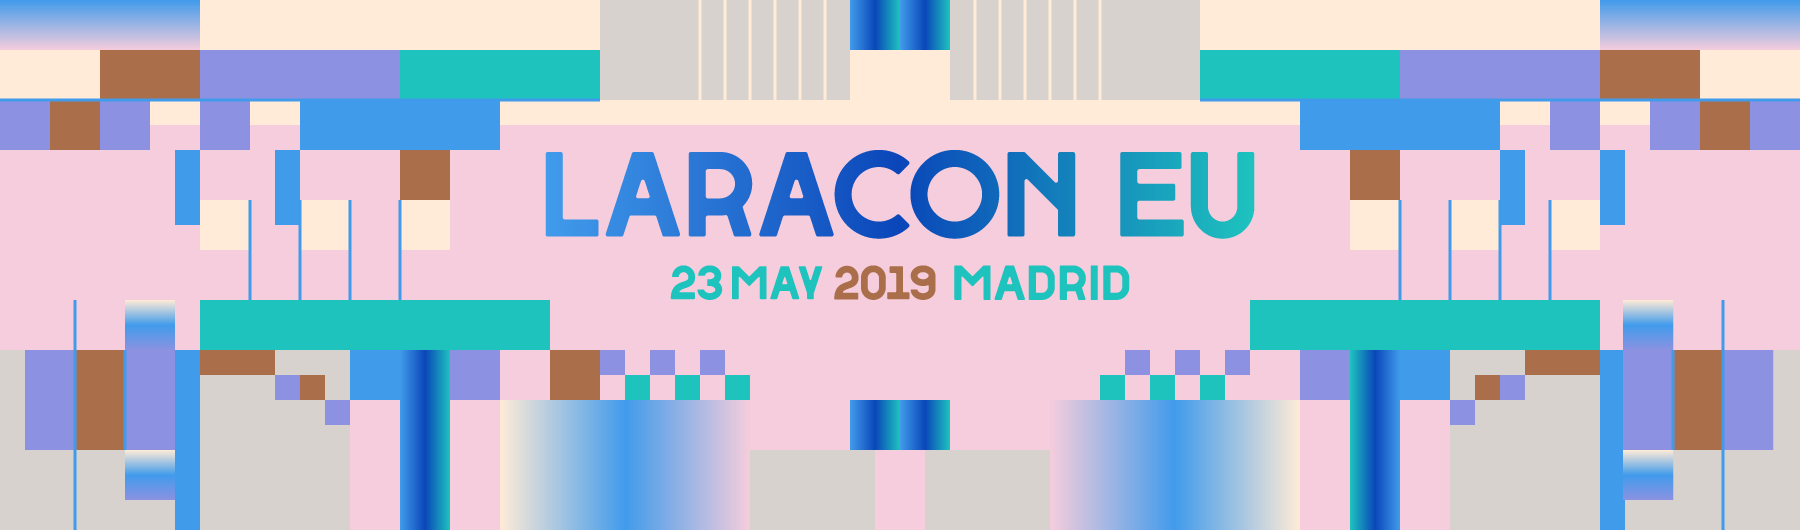 Laracon EU Madrid 2019